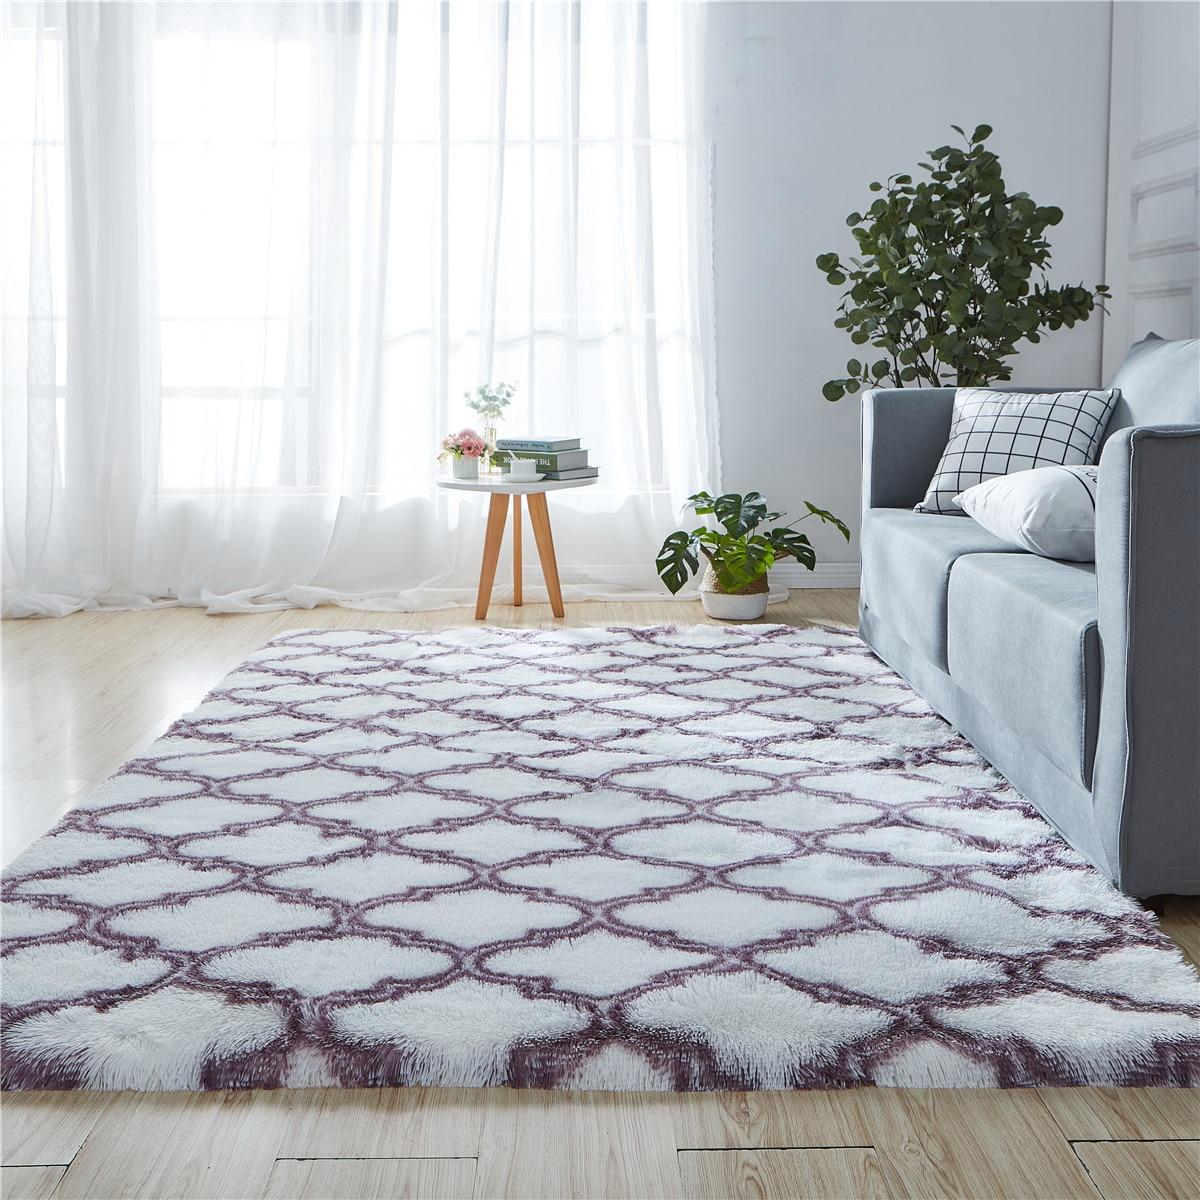 Tie Dyeing Carpets For Living Room Home Soft Fluffy Rug Modern Shaggy Bedroom Carpet Sofa Coffee Table Plush Rug Kids Floor Mat